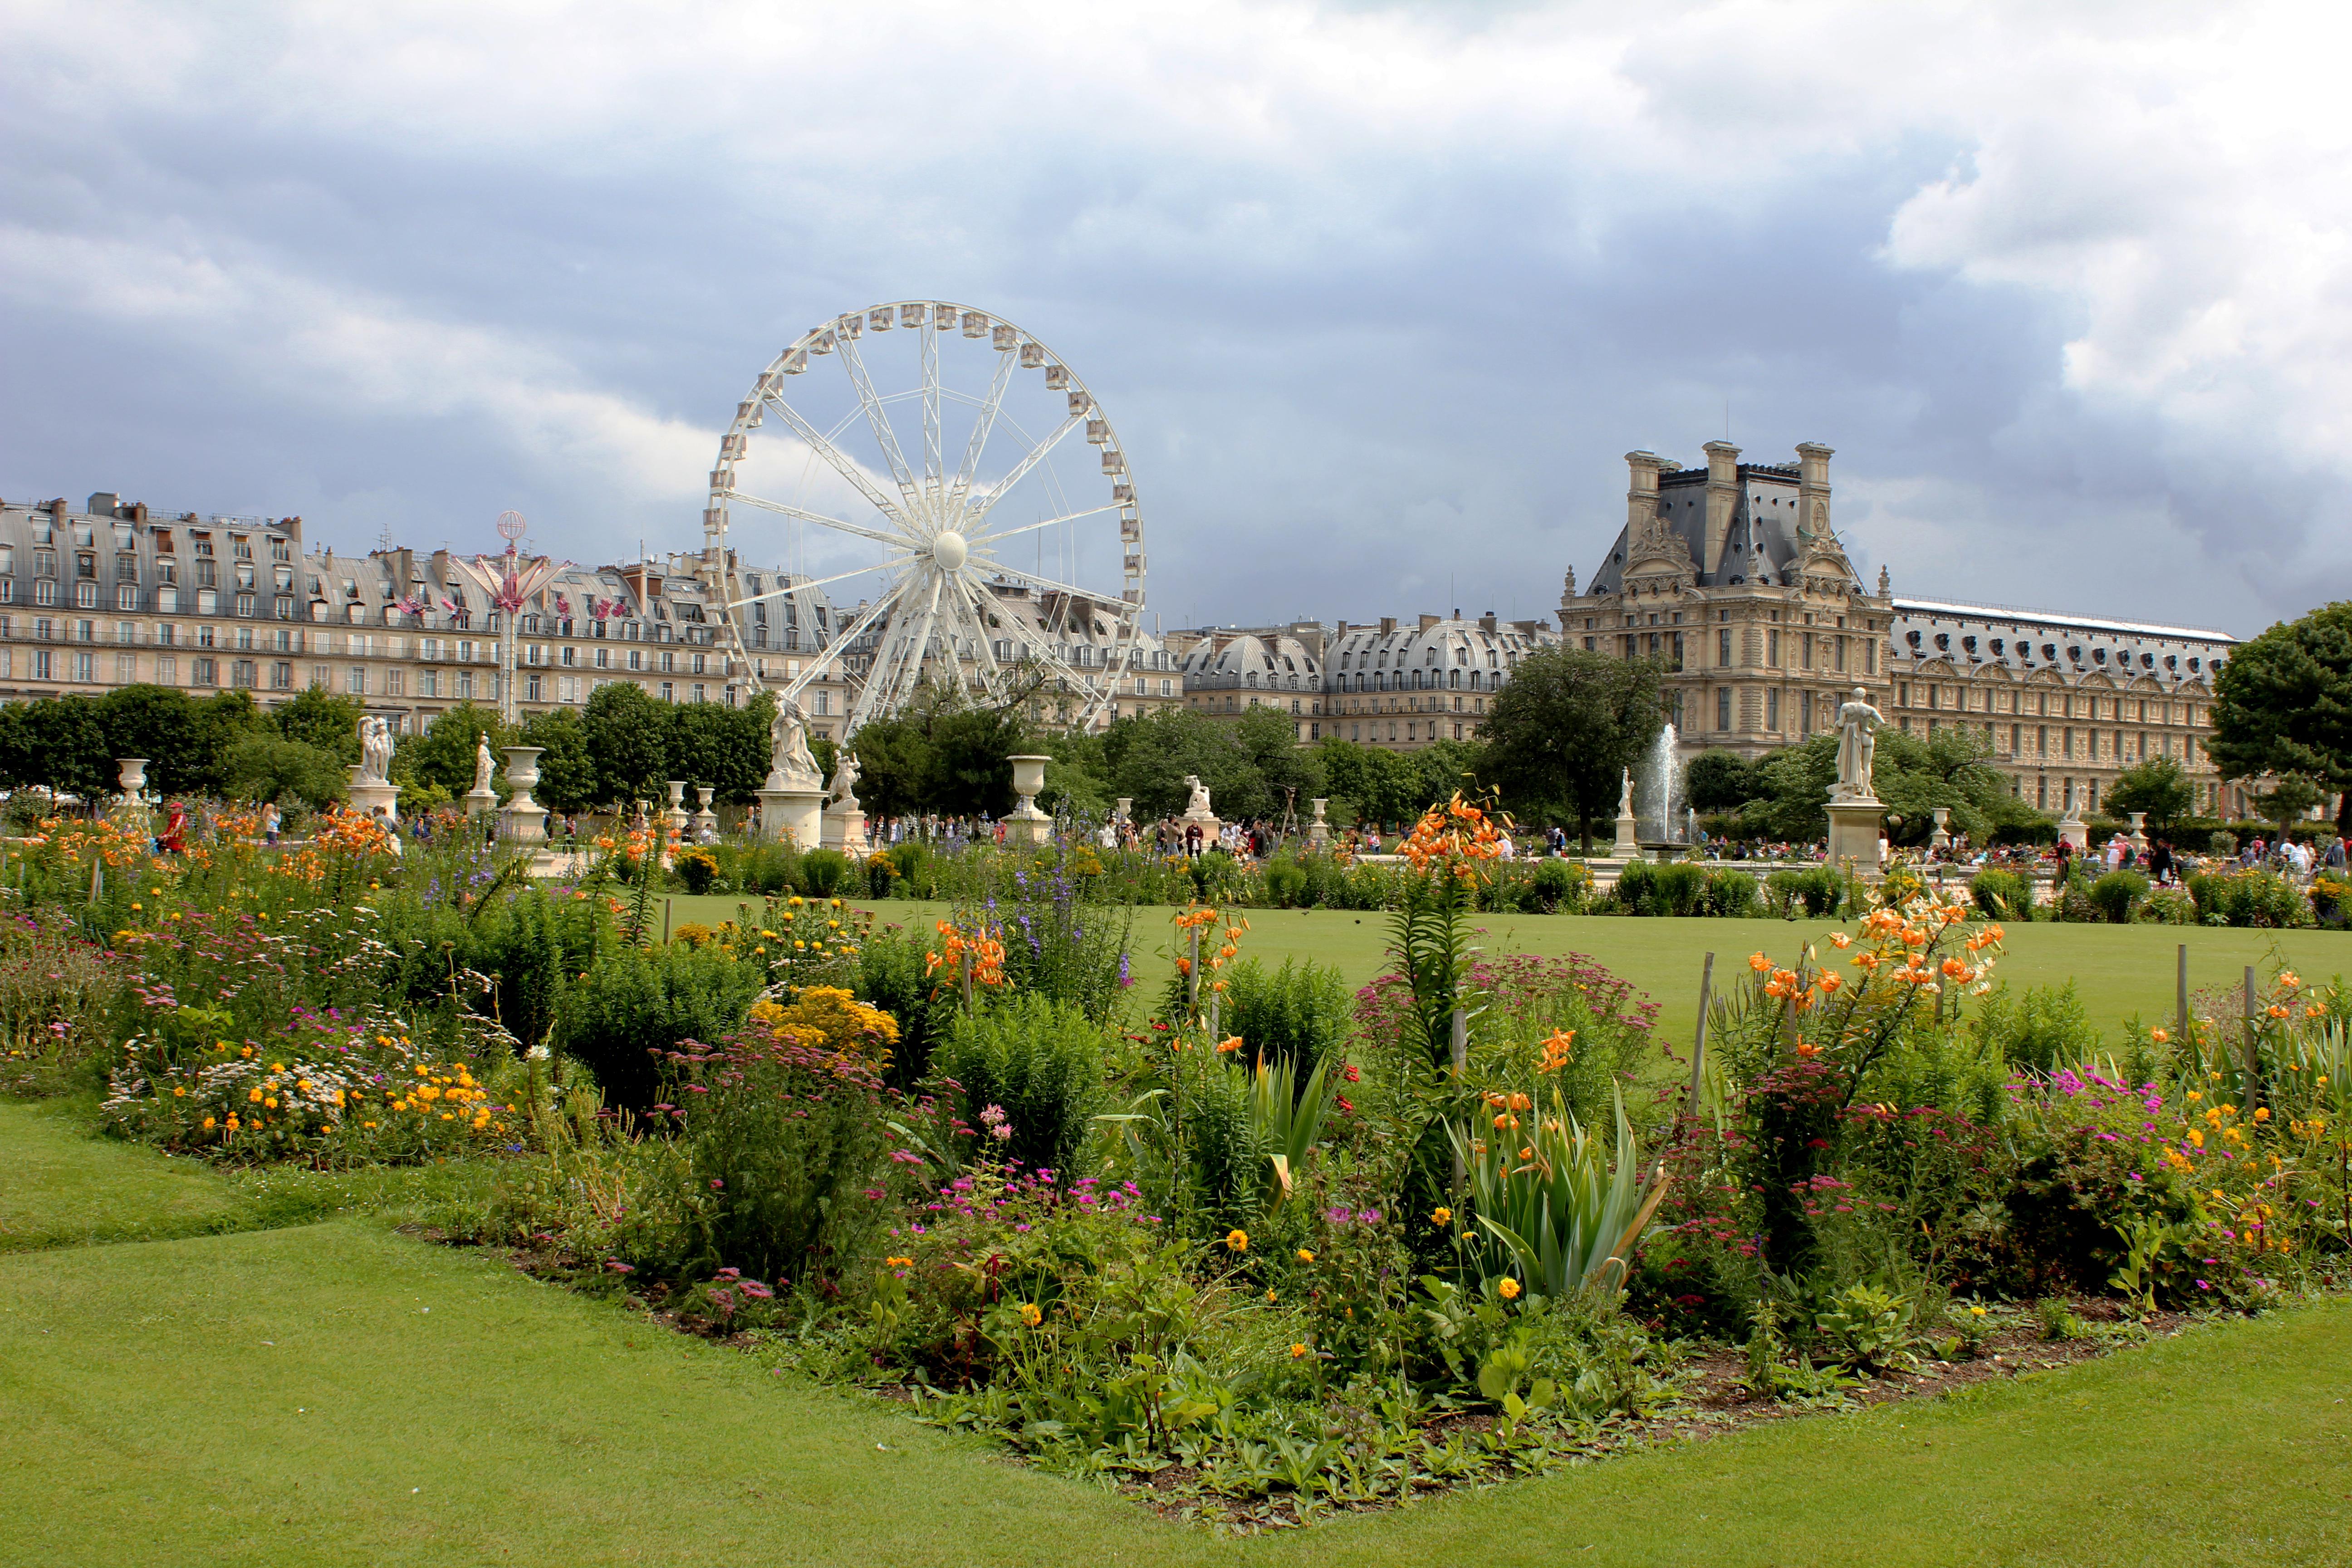 Outdoor Flower City Paris Recreation France Europe Green Amusement Park Louvre Color Landmark Botany Garden